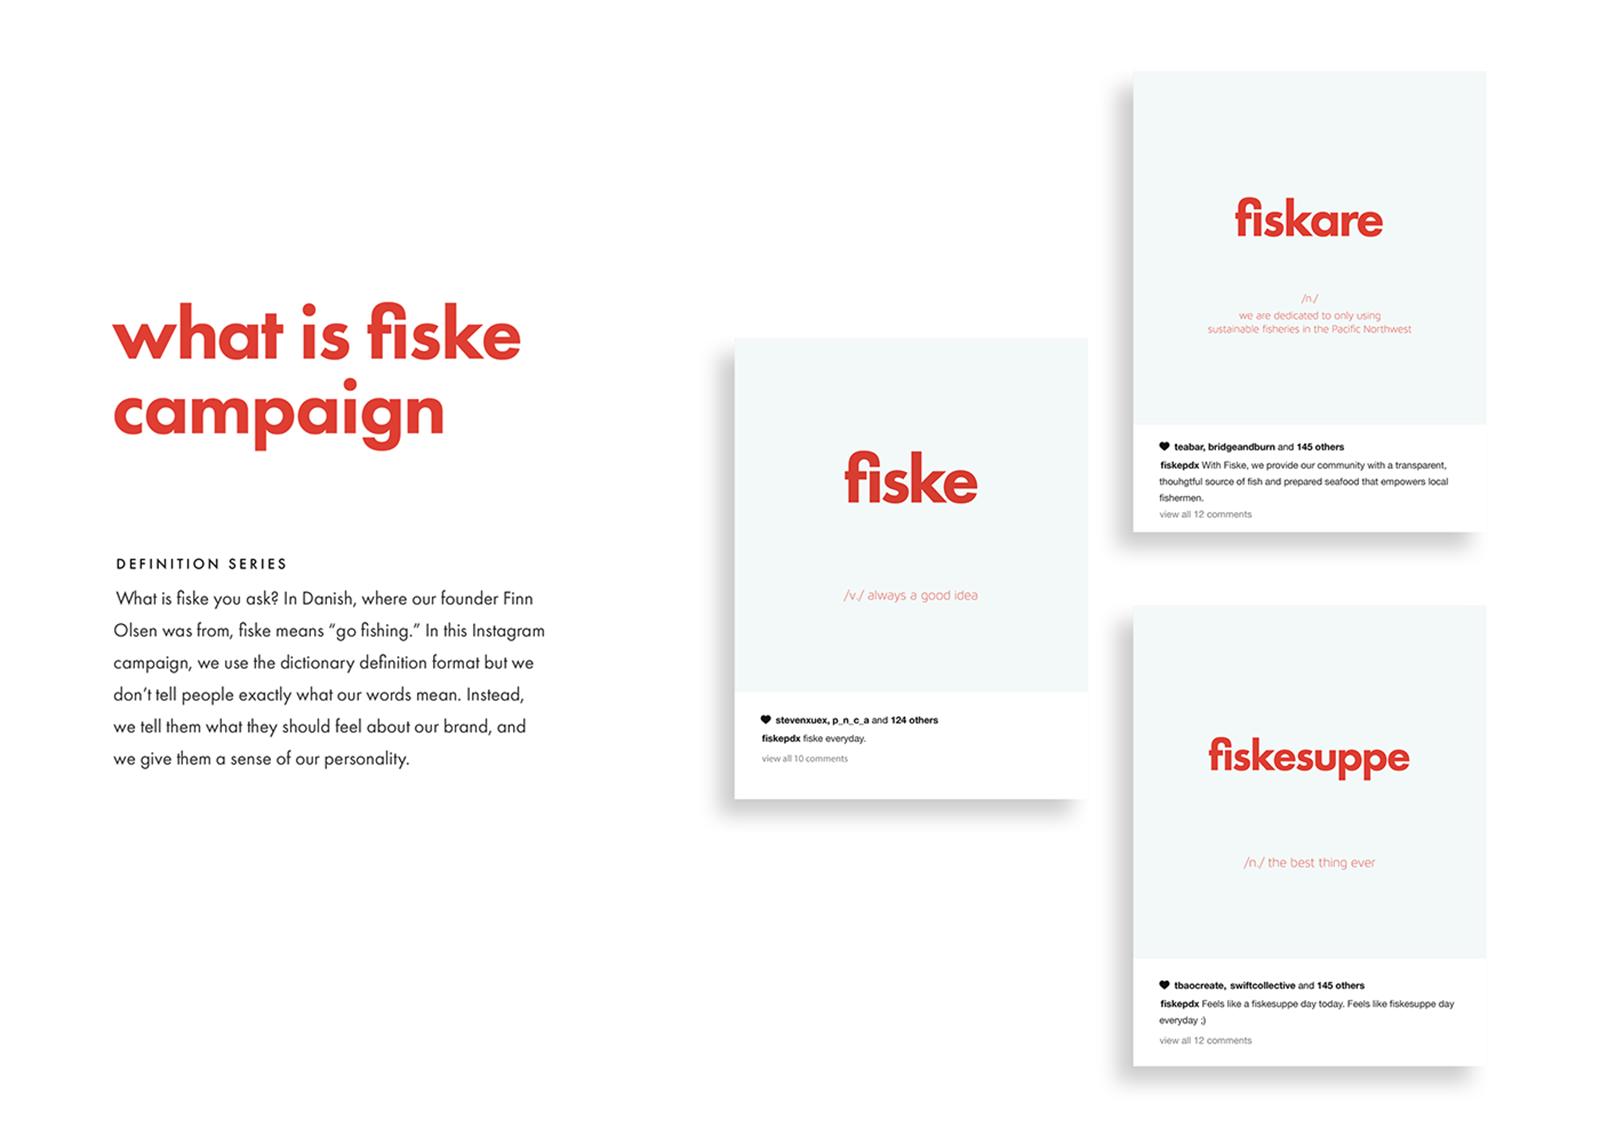 Fiske海鲜餐厅品牌视觉VI形象设计整理欣赏-VI设计5